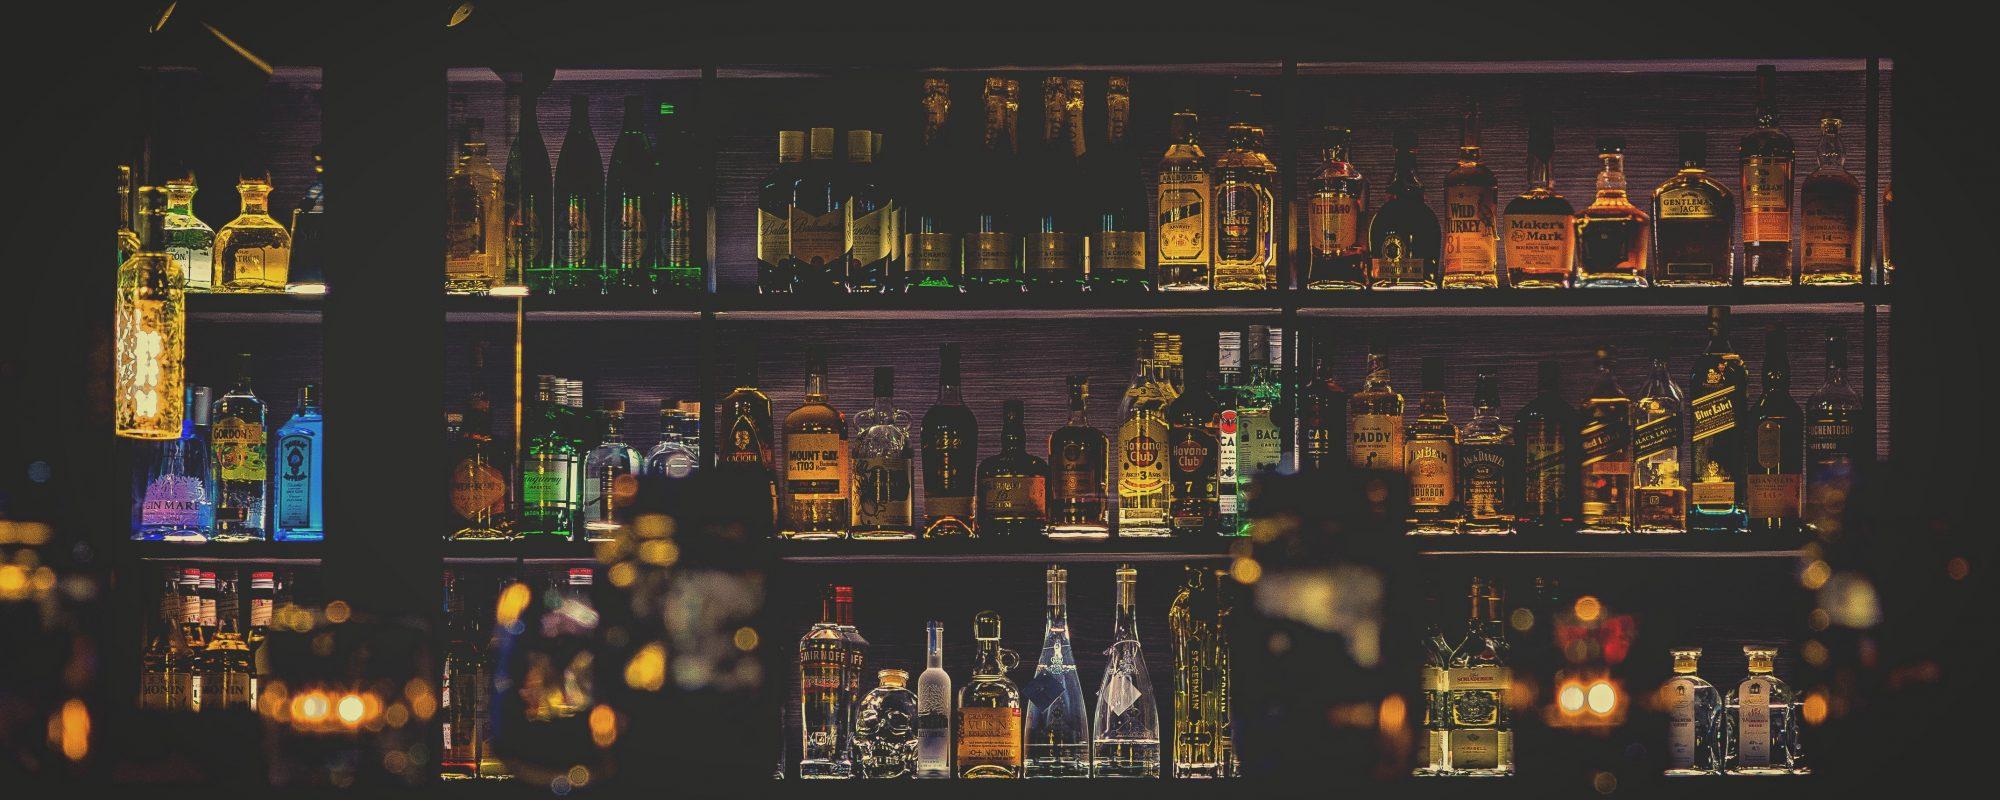 best bars kyoto